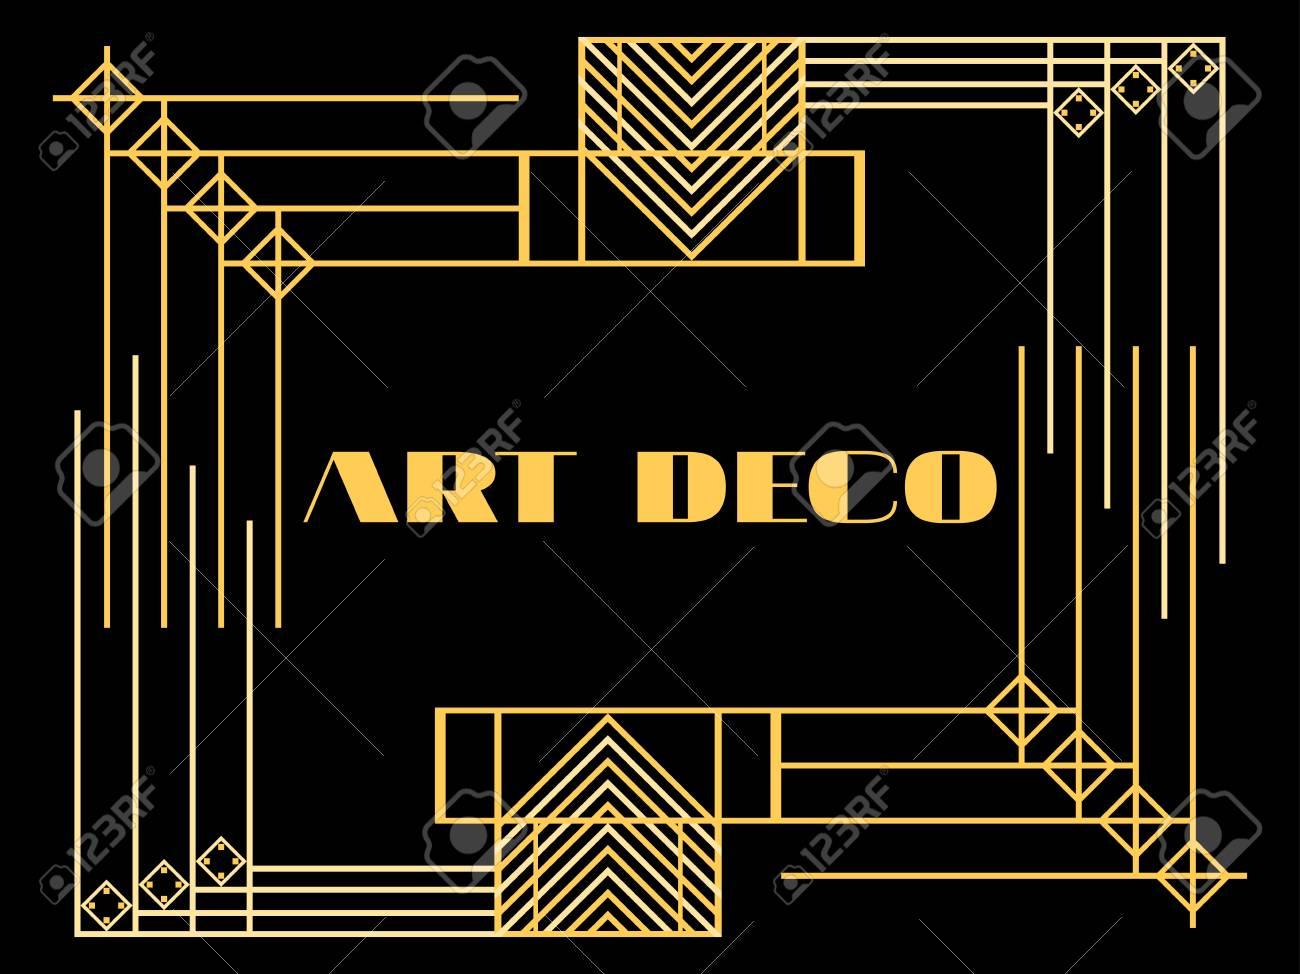 Art deco frame  Art deco geometric vintage frame  Retro style